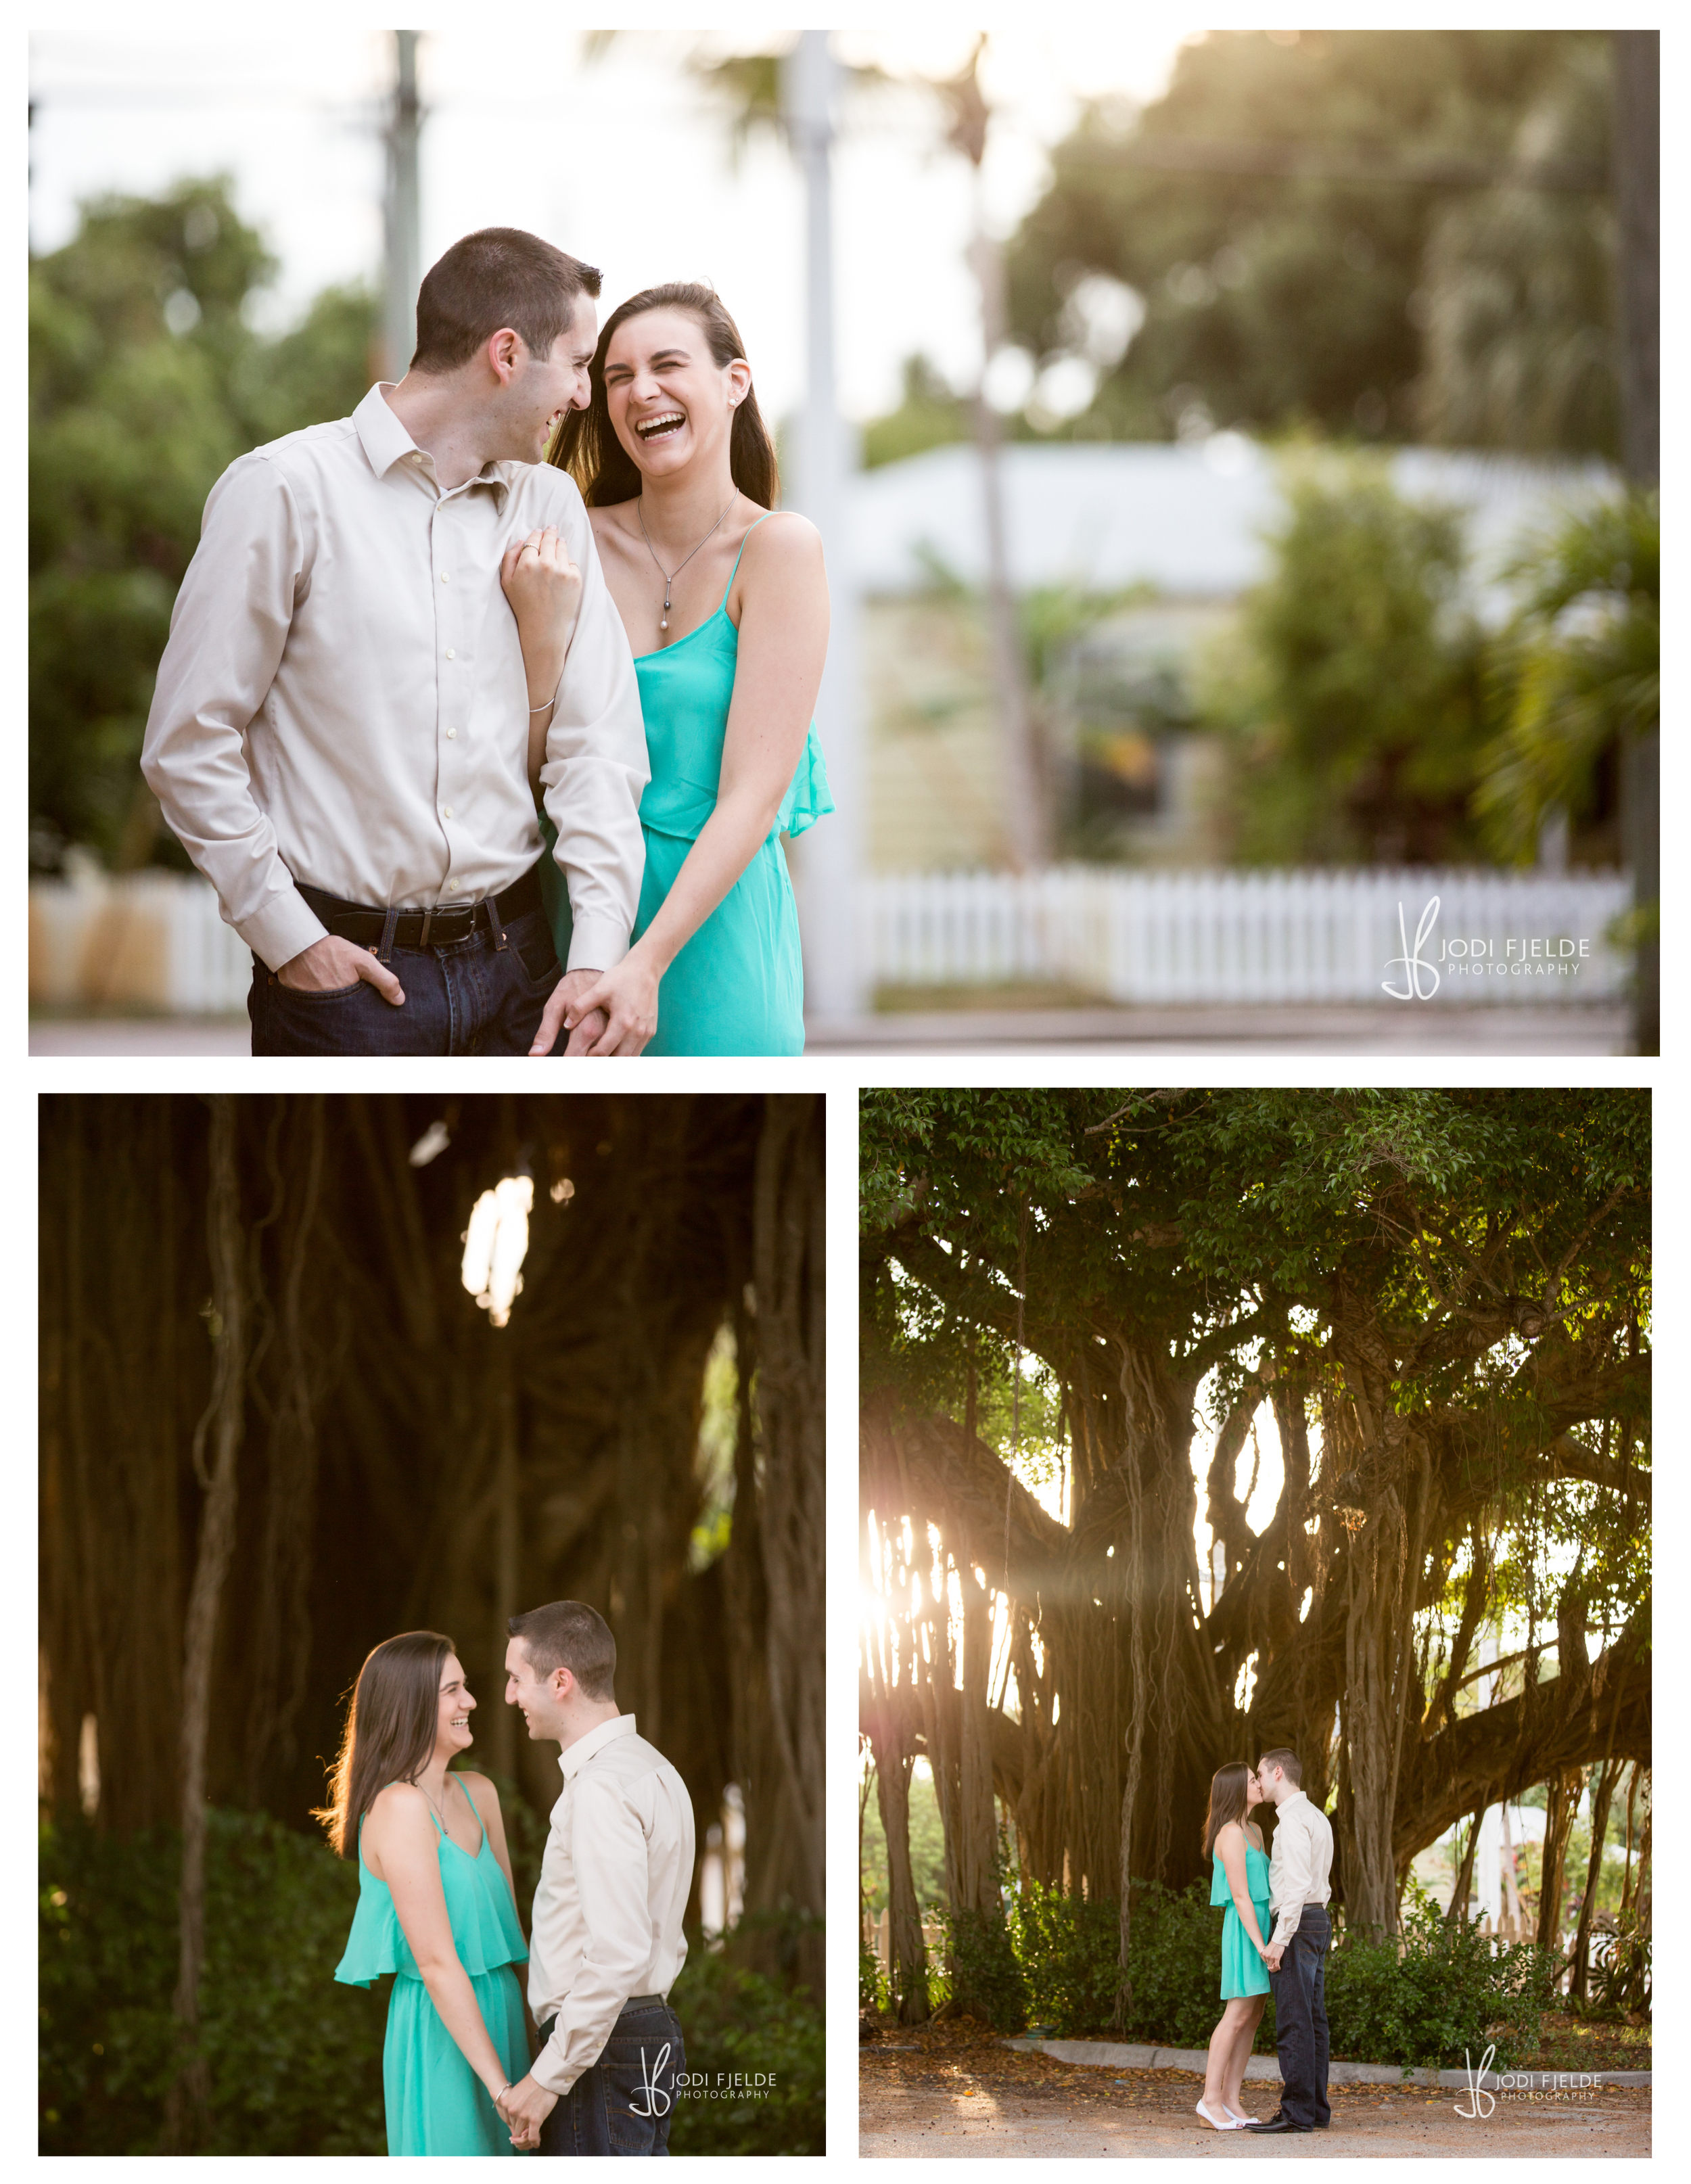 Delray_BEach_Sundy_HouseFlorida_engagement_E-session_Allison_&_Matt_photography_jodi_Fjelde_photography_5.jpg